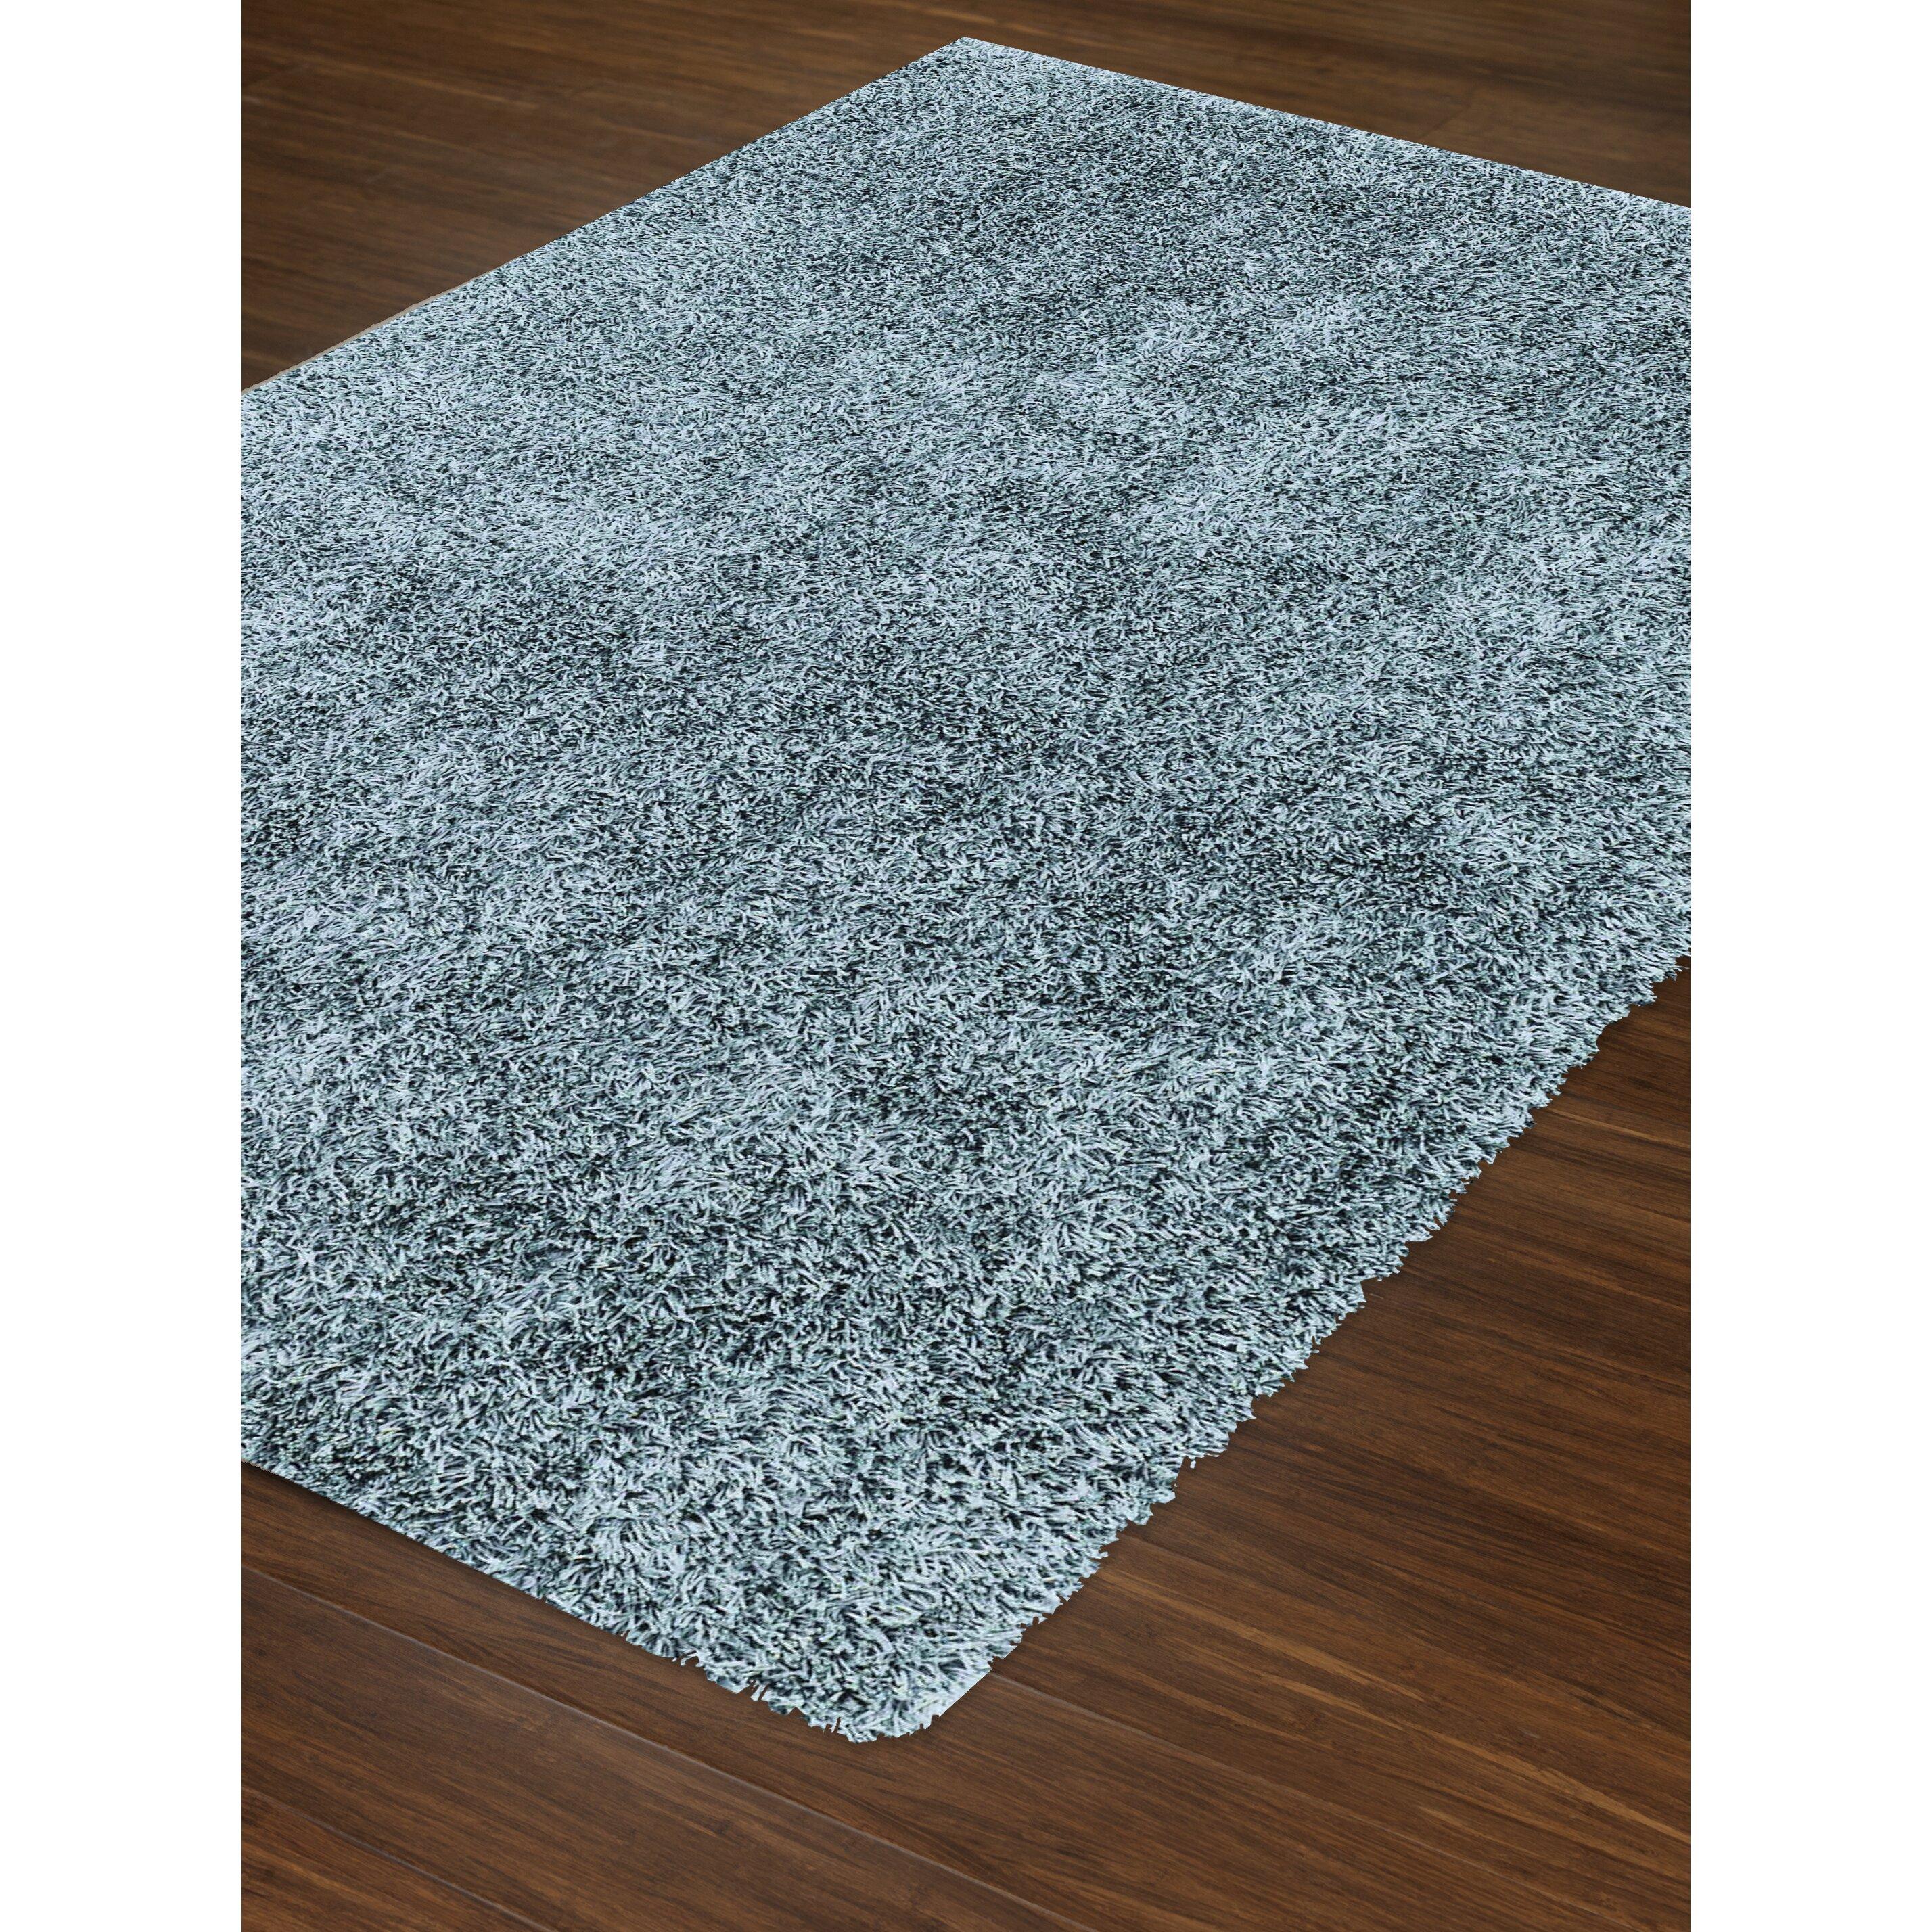 slate blue rug | roselawnlutheran